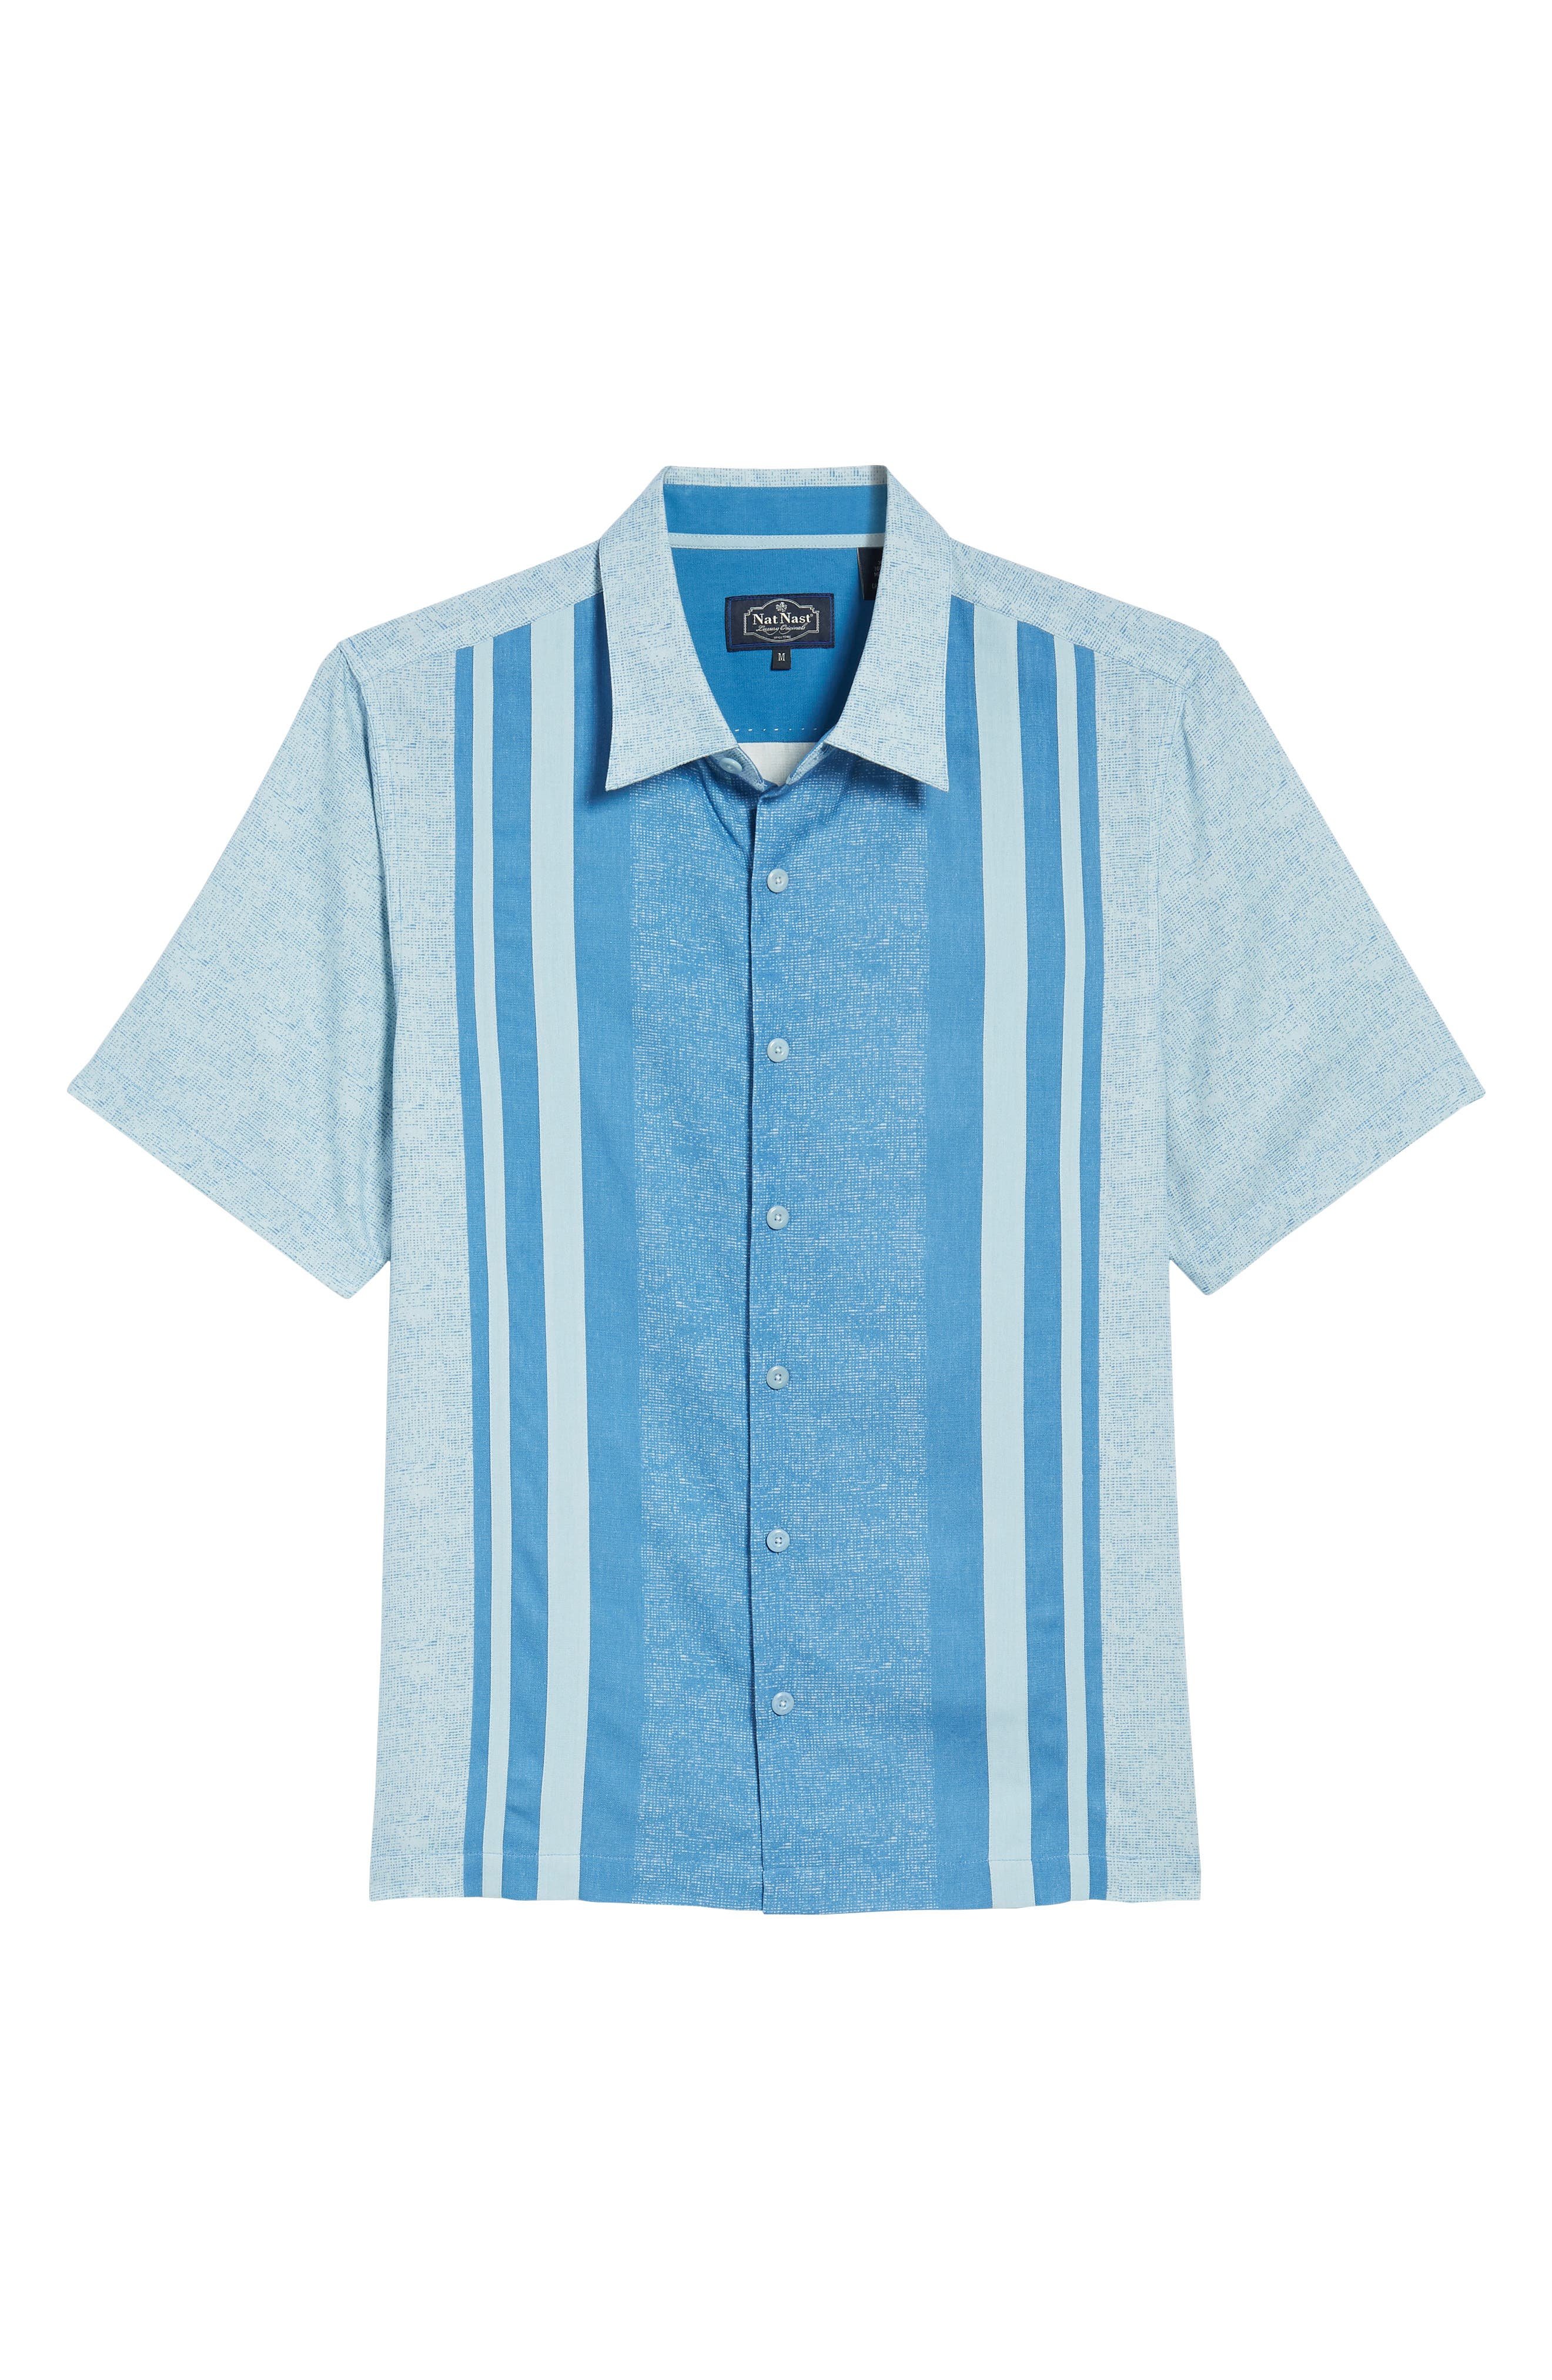 All Mixed Up Camp Shirt,                             Alternate thumbnail 6, color,                             Cornflower